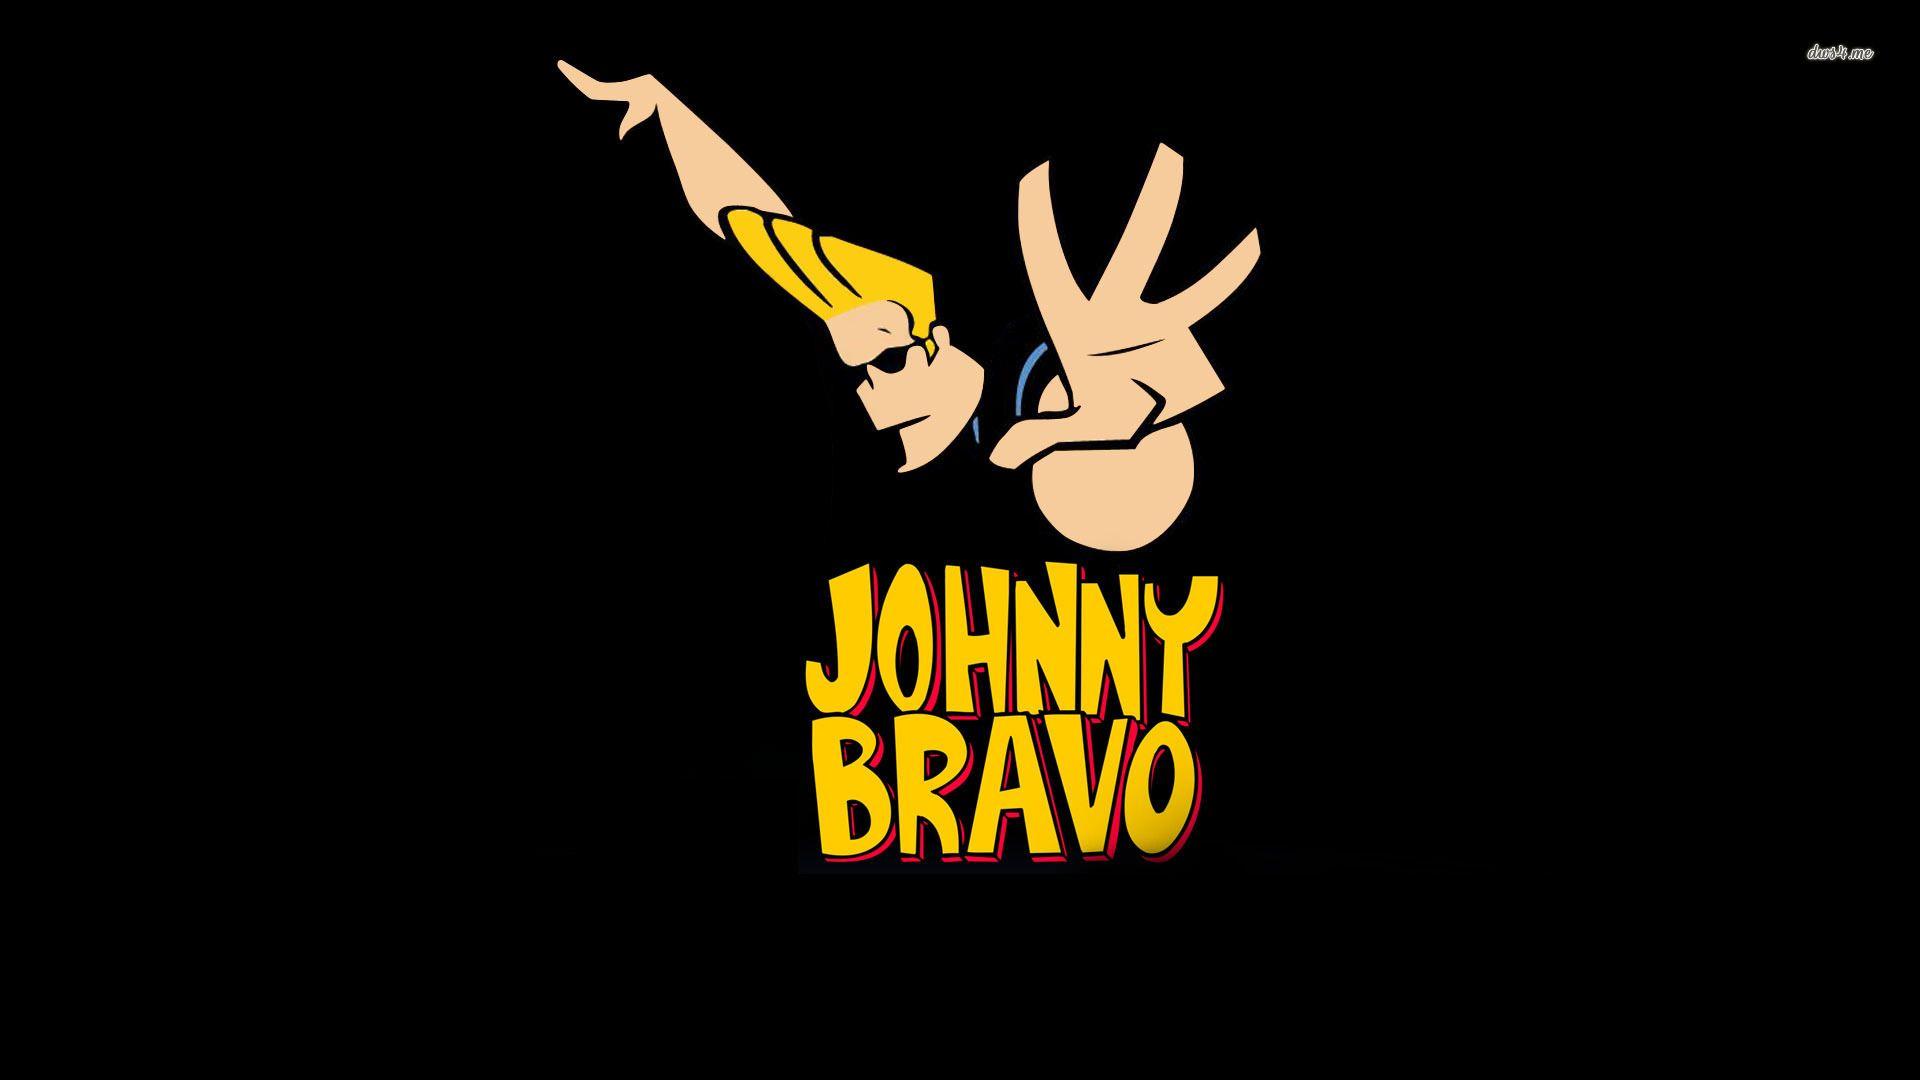 Johnny Bravo HD Wallpapers